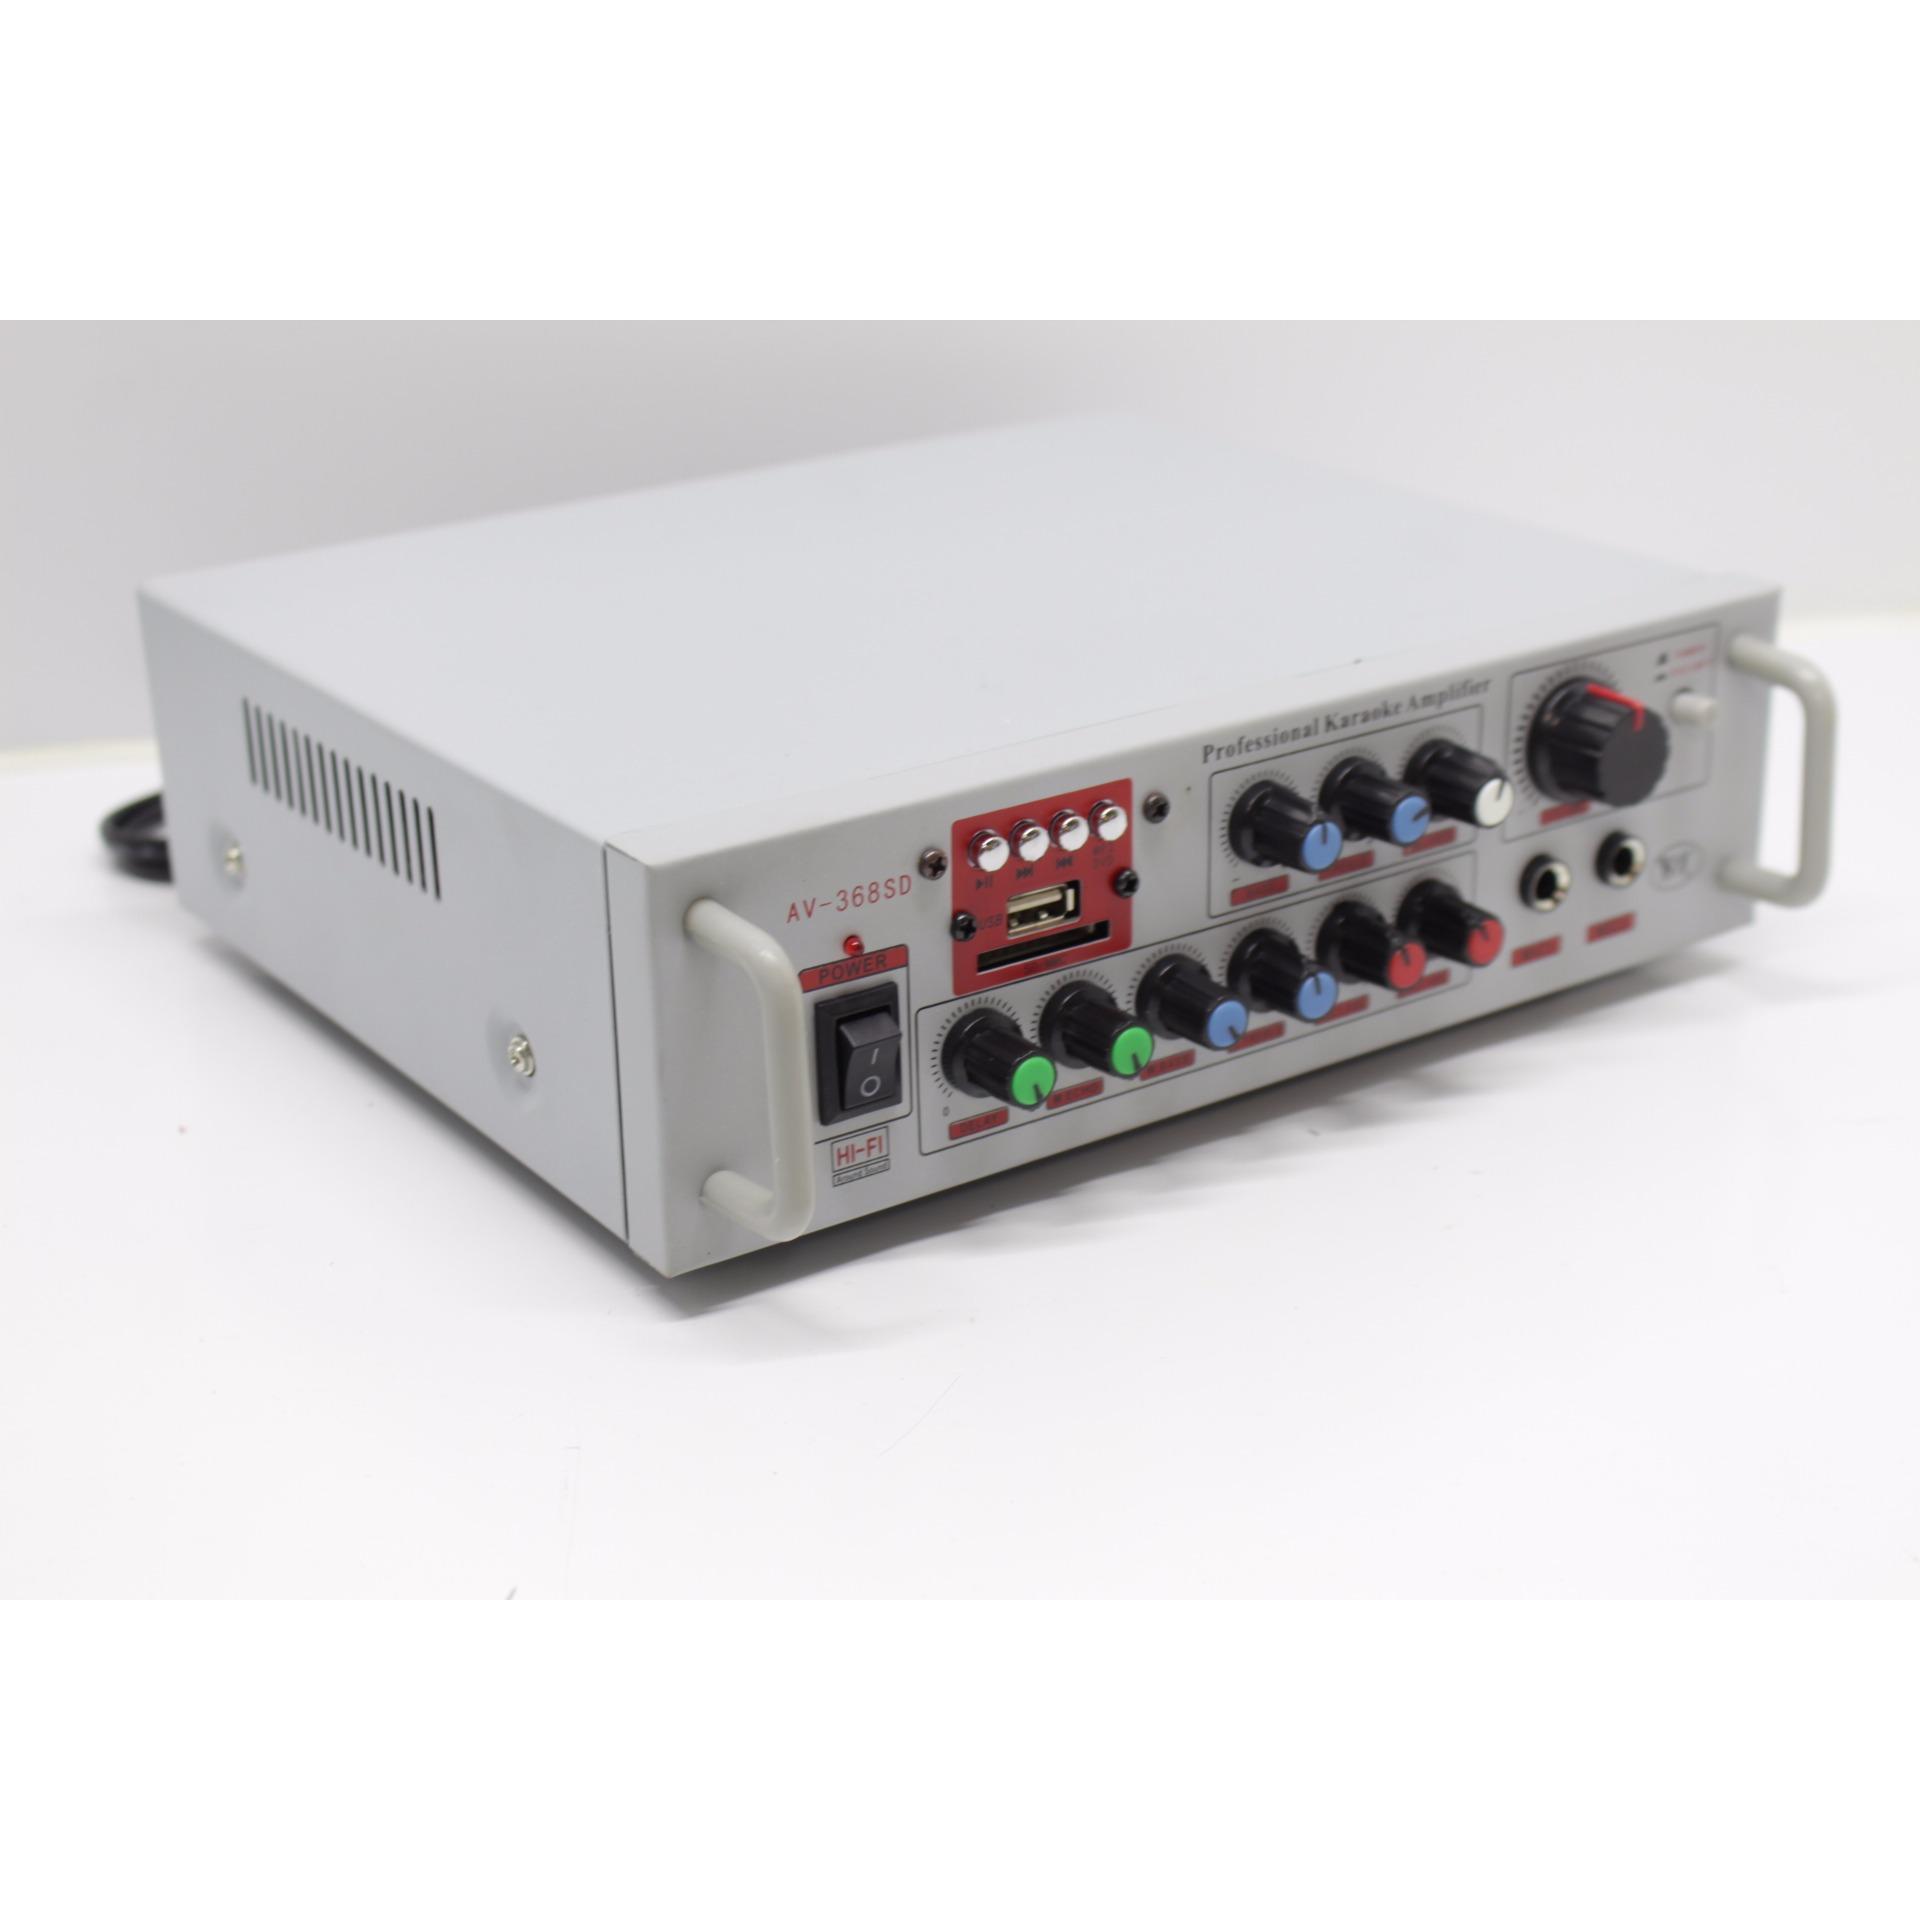 Ampli Mini 12V/220V 3 in 1 Suoer AV-368SD ( Trắng )